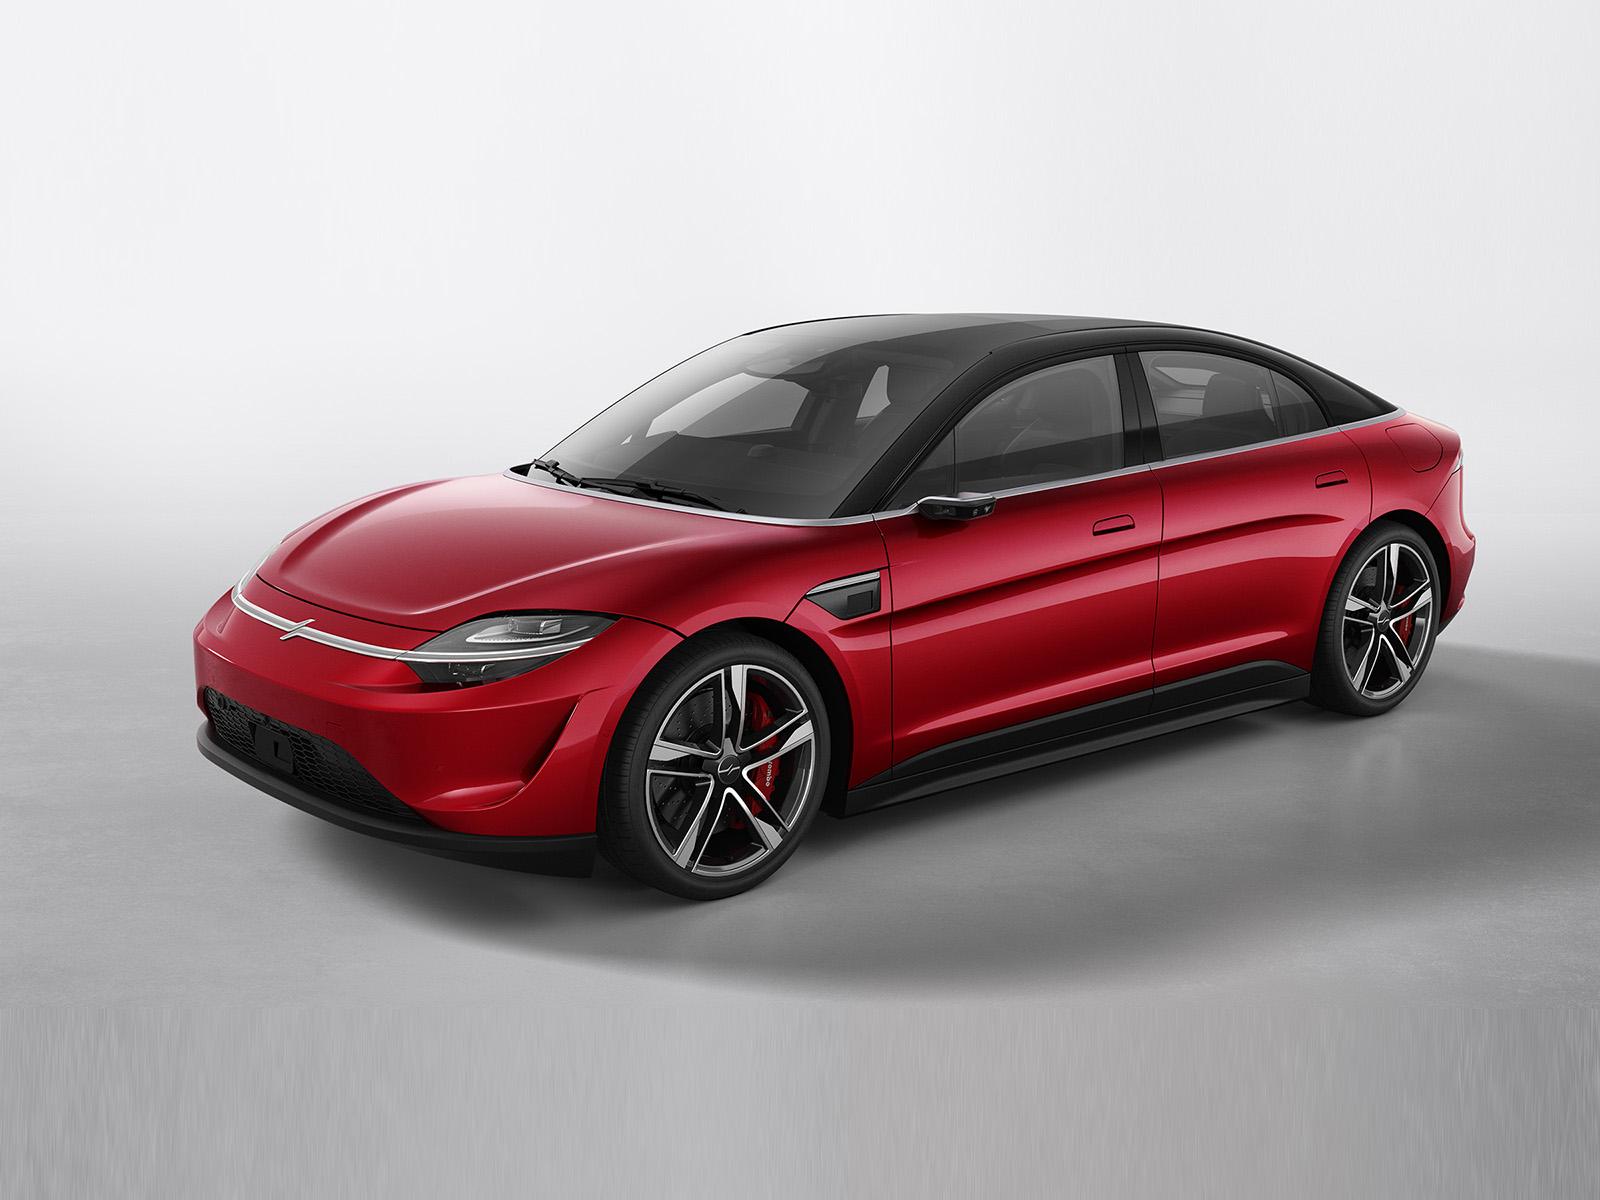 2020款索尼Vision-S概念车